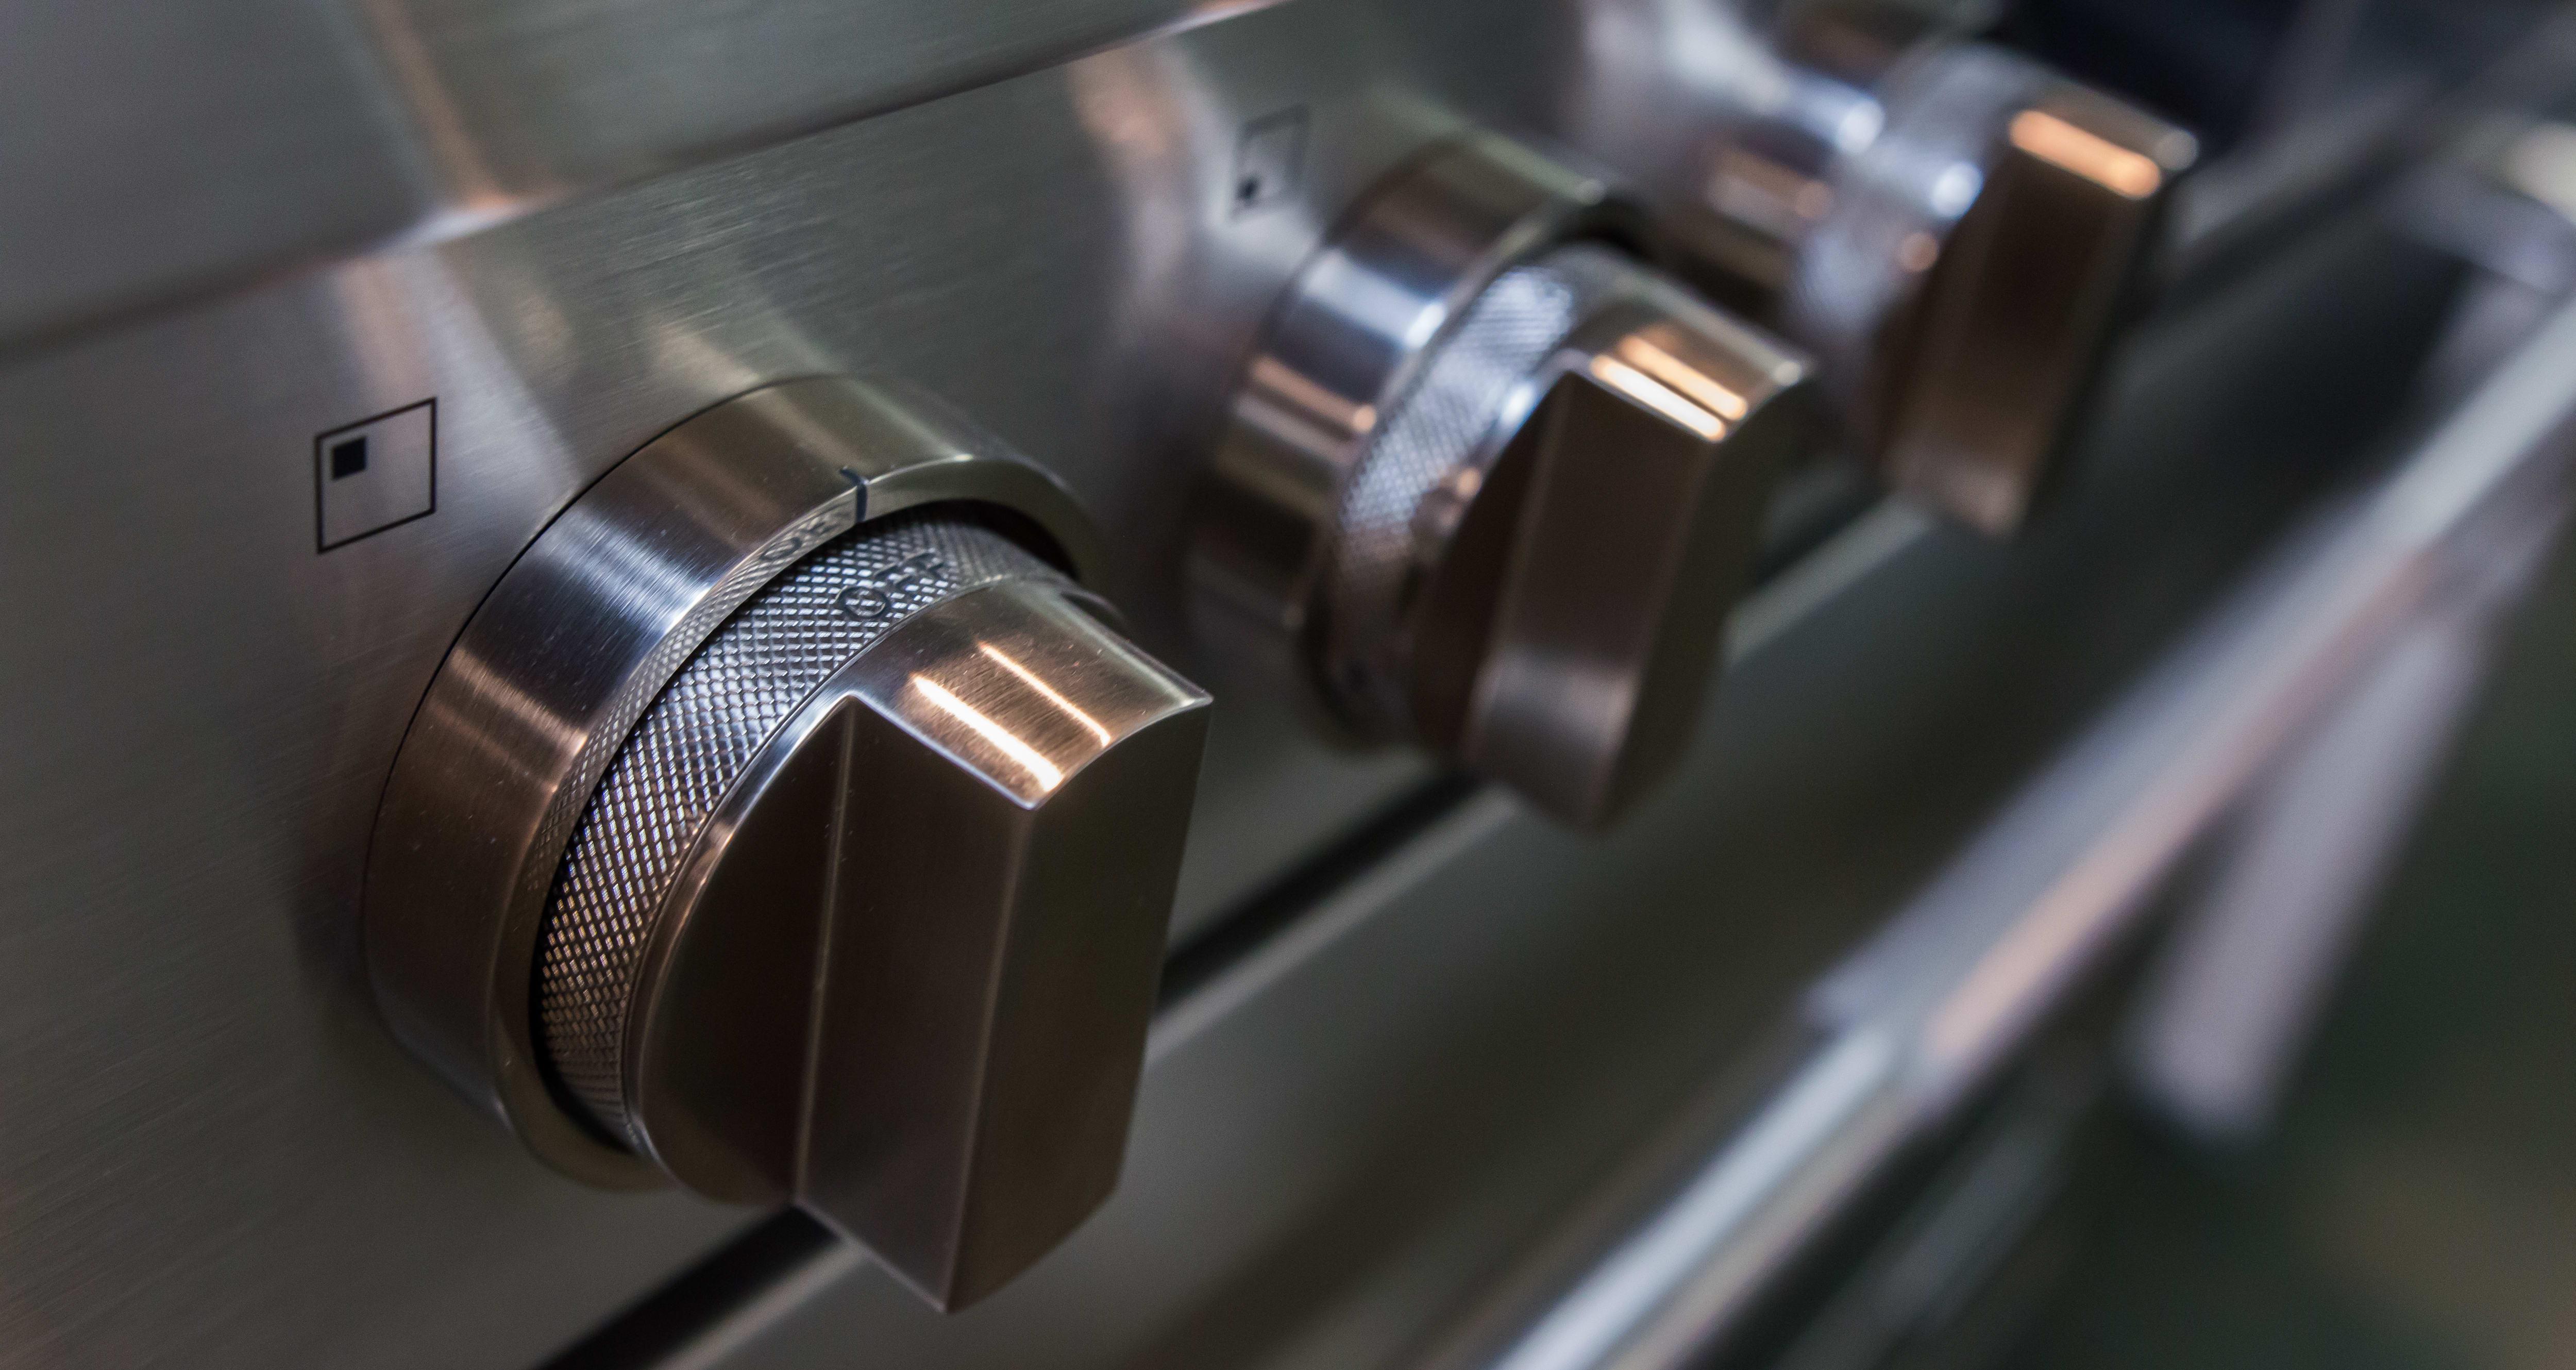 Rangetop control knobs